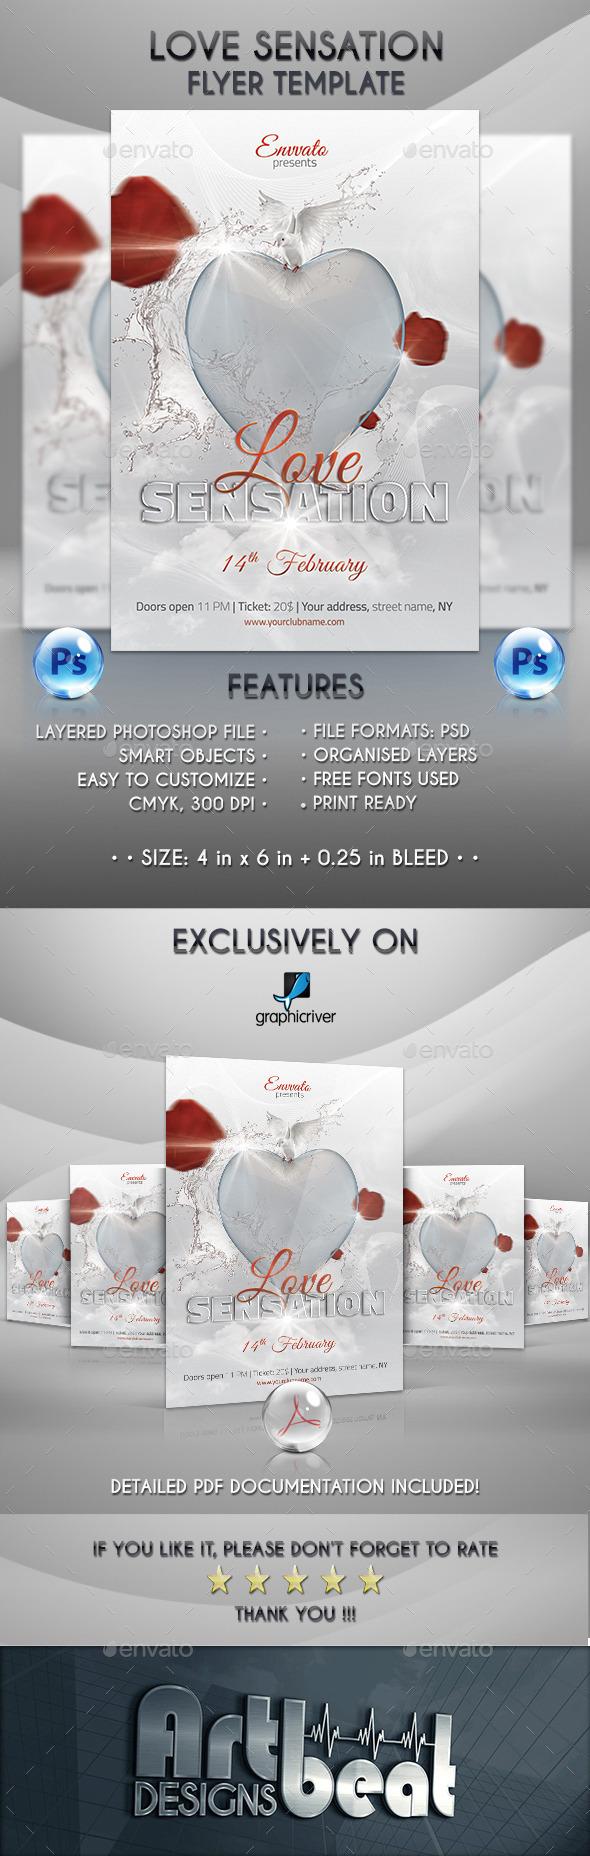 GraphicRiver Love Sensation Flyer Template 10039146